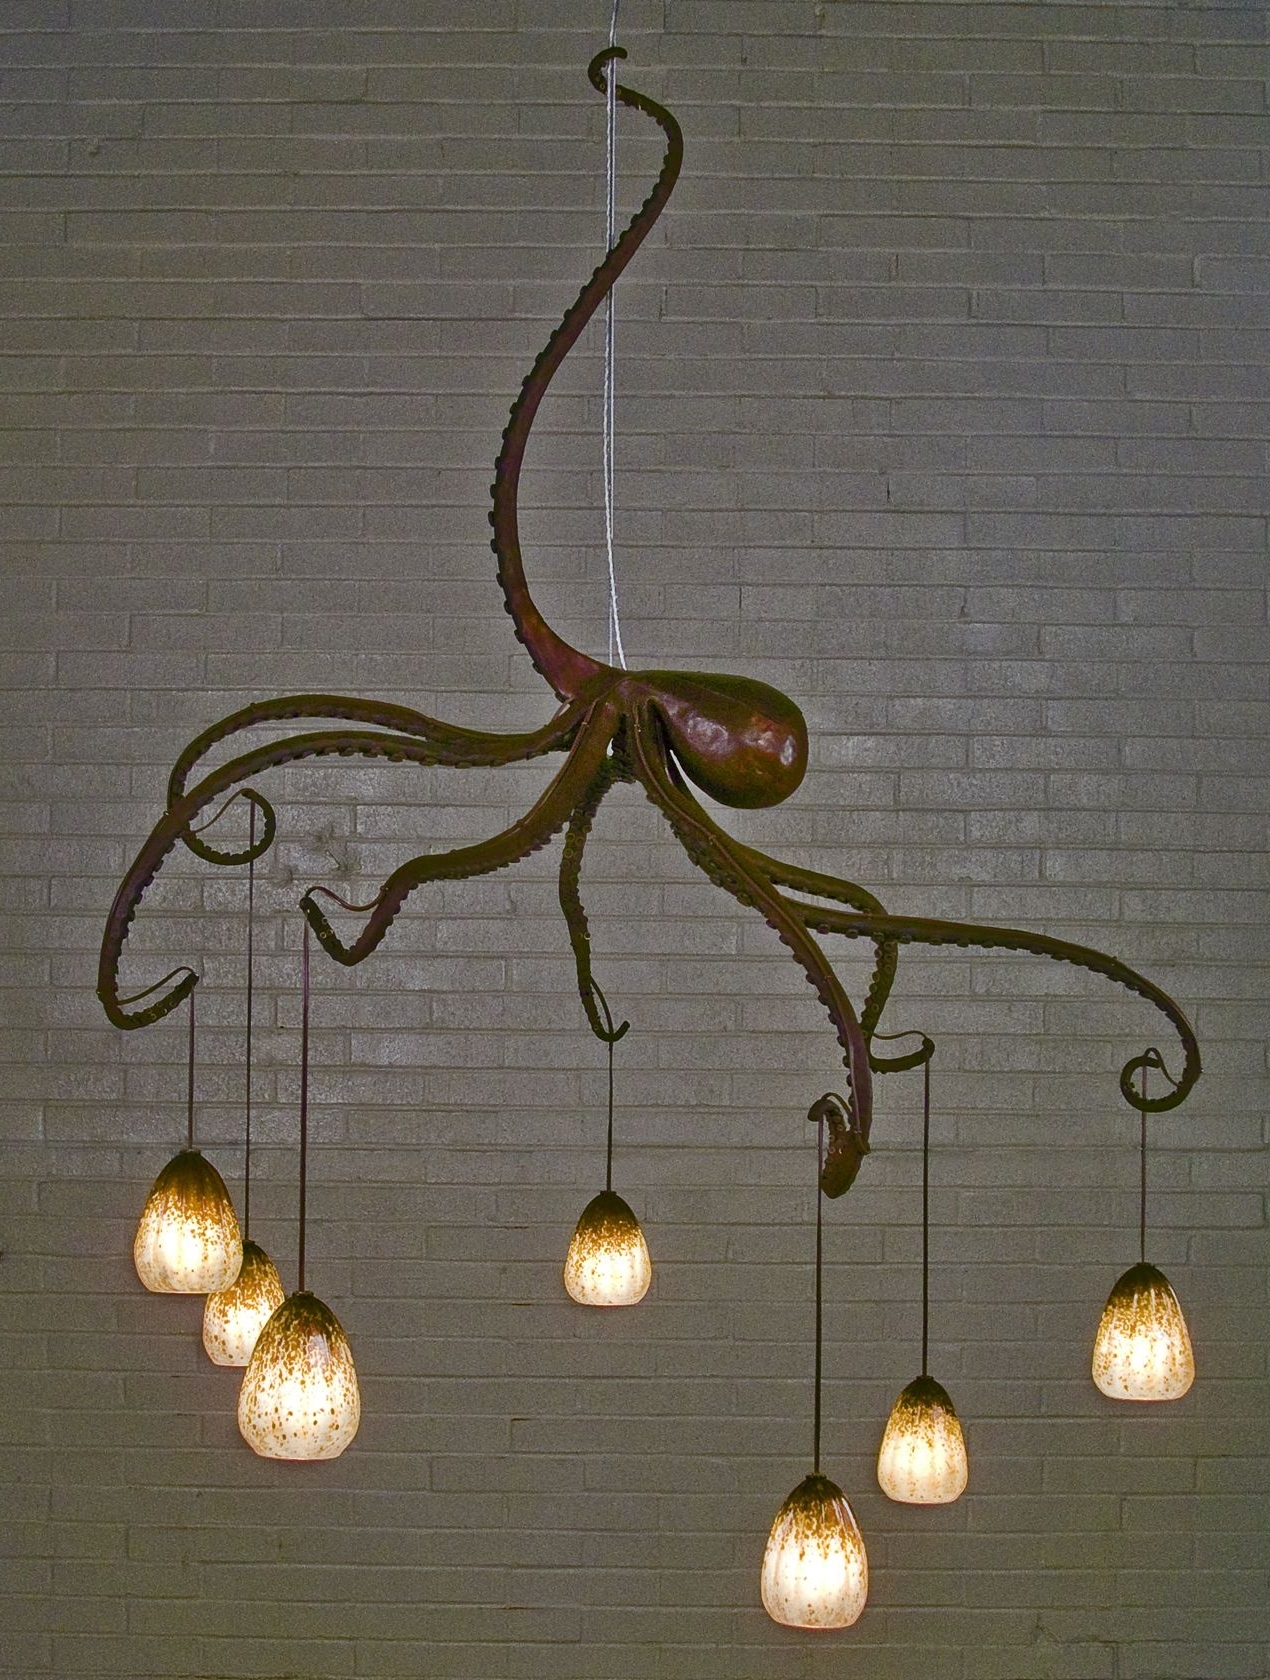 Chandelier For Restaurant Pertaining To Newest Octopus Chandelier Made For Michael Chiarello's Restaurant, Bottega (View 4 of 20)